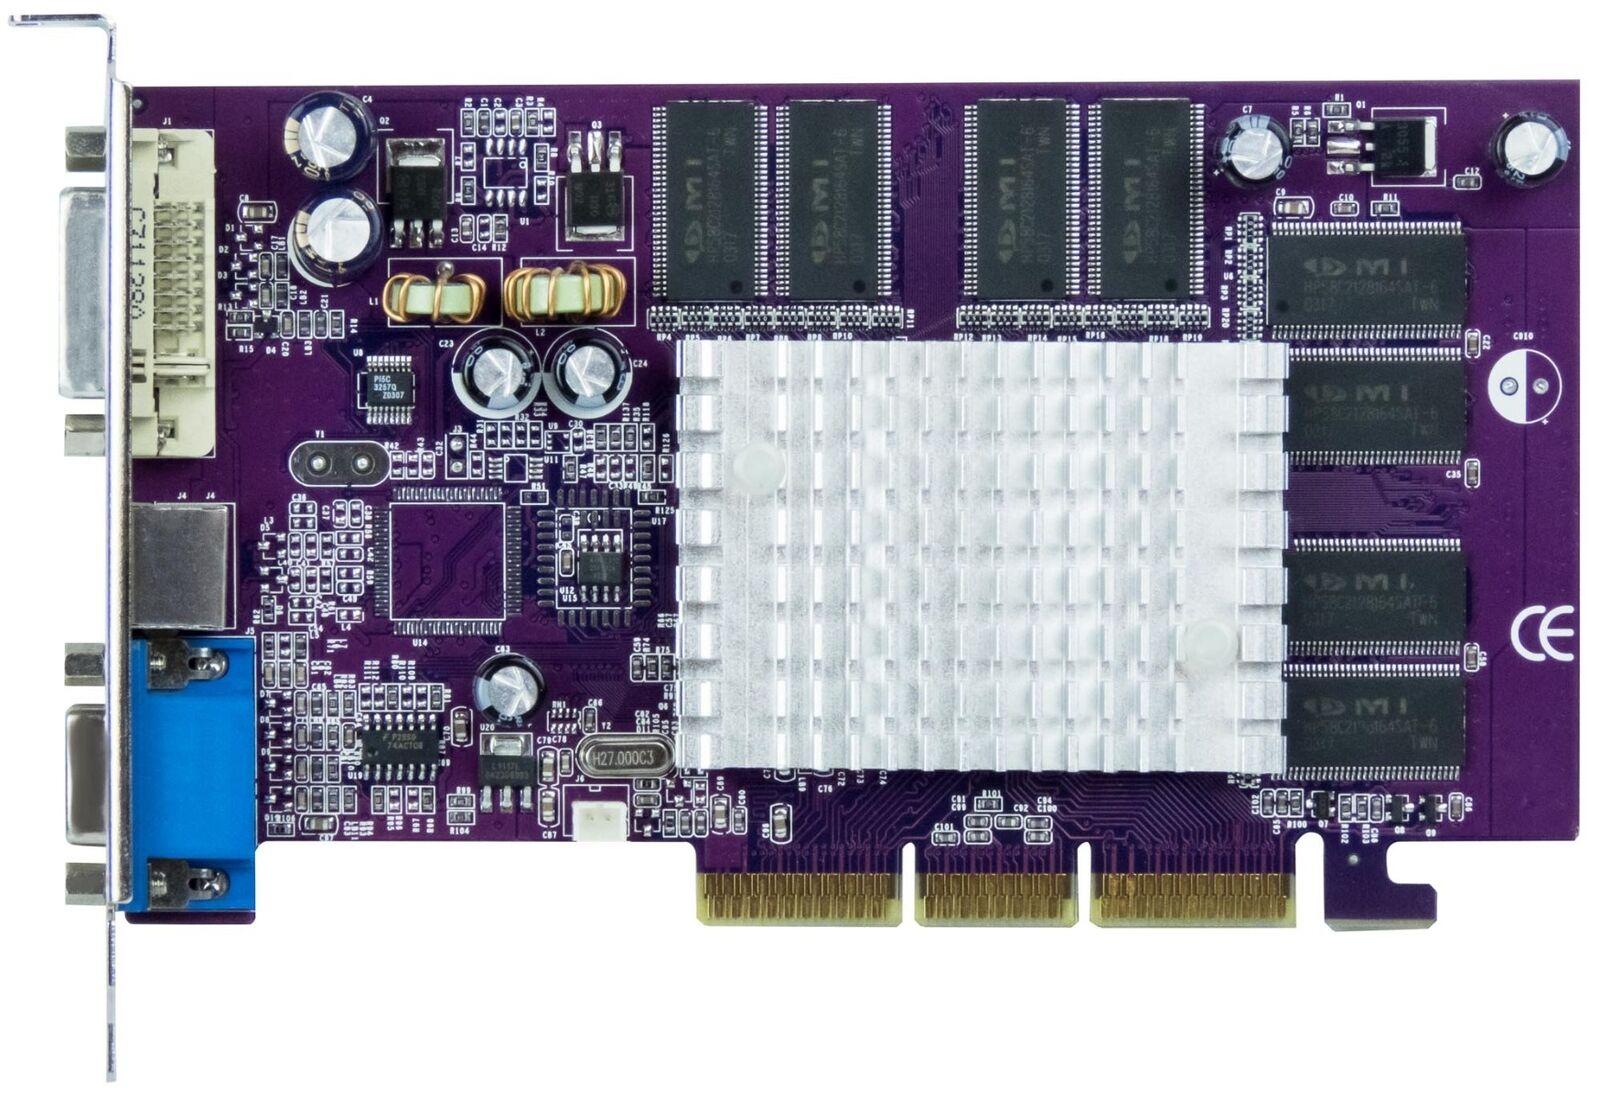 PALIT NVIDIA GEFORCE FX 5200 128MB DDR AGP